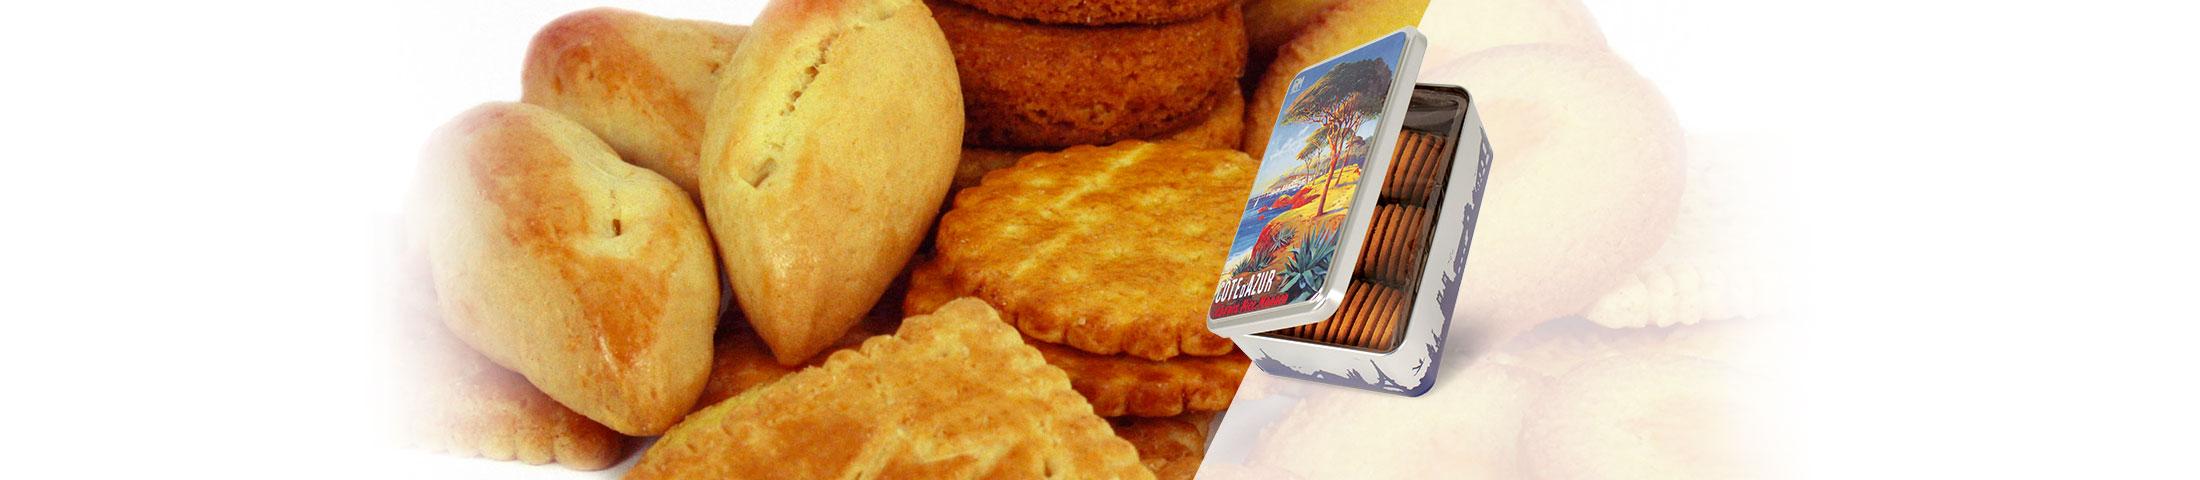 biscuits-delaunay-leveille-boite-metal